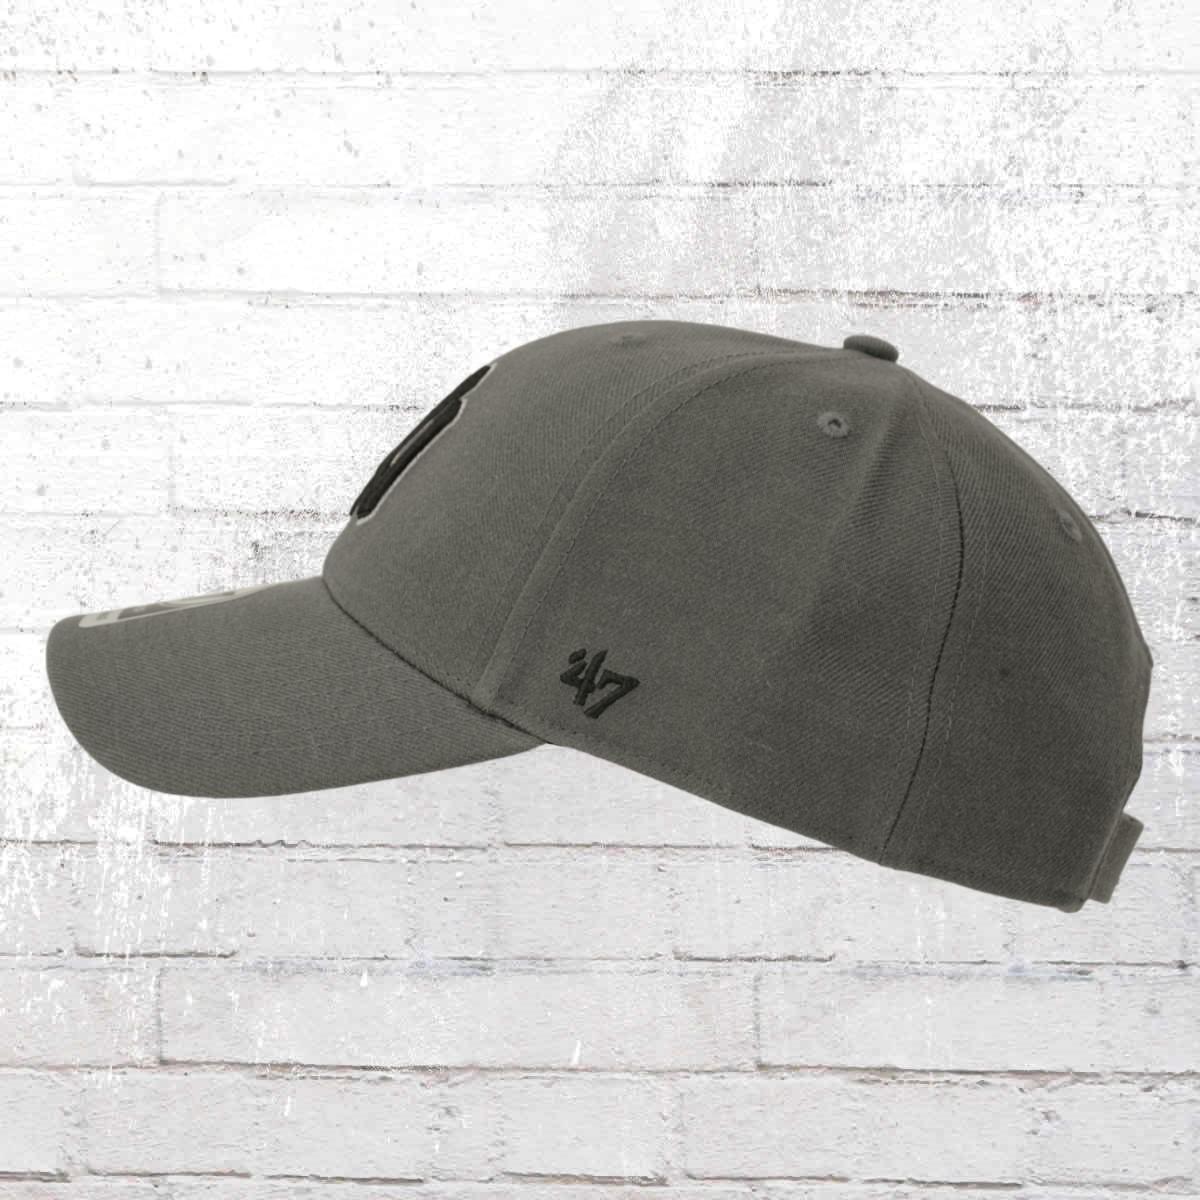 best website ff7fa fd4d5 57b16 8ed1d  wholesale have you seen 47 brand kids mlb team hat ny yankees  cap black 7b2e1 ab17a